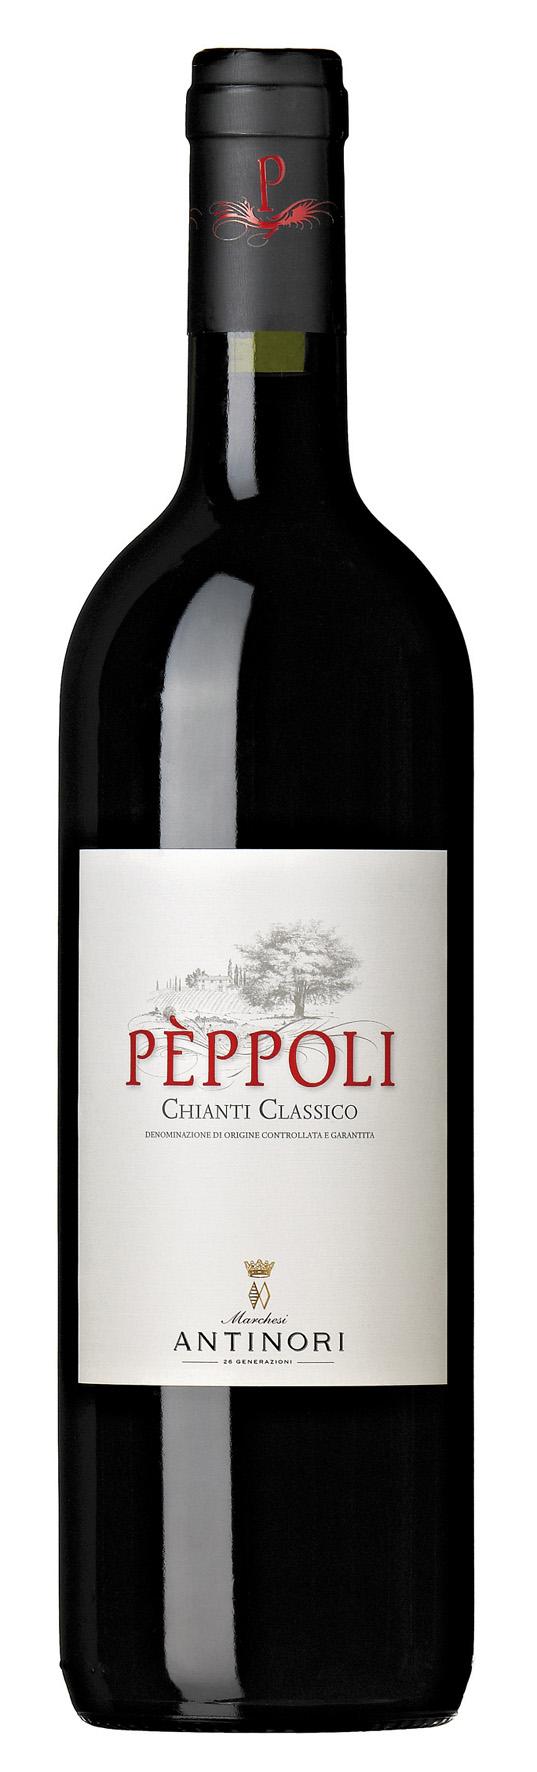 2015 Peppoli Chianti Classico DOCG Antinori